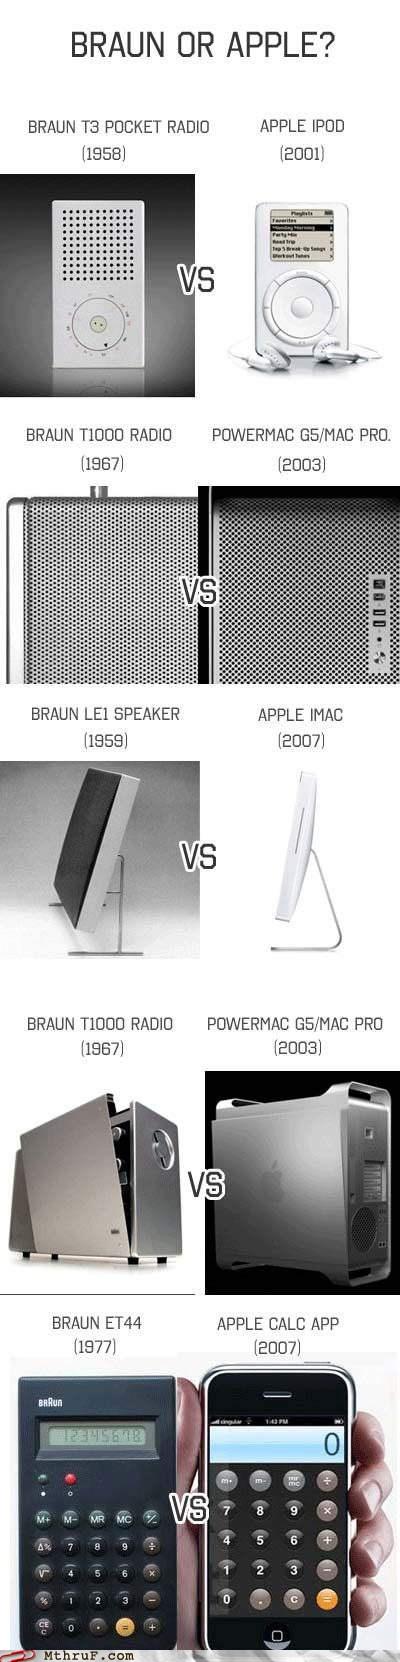 Monday Thru Friday: We're Onto You, Apple!